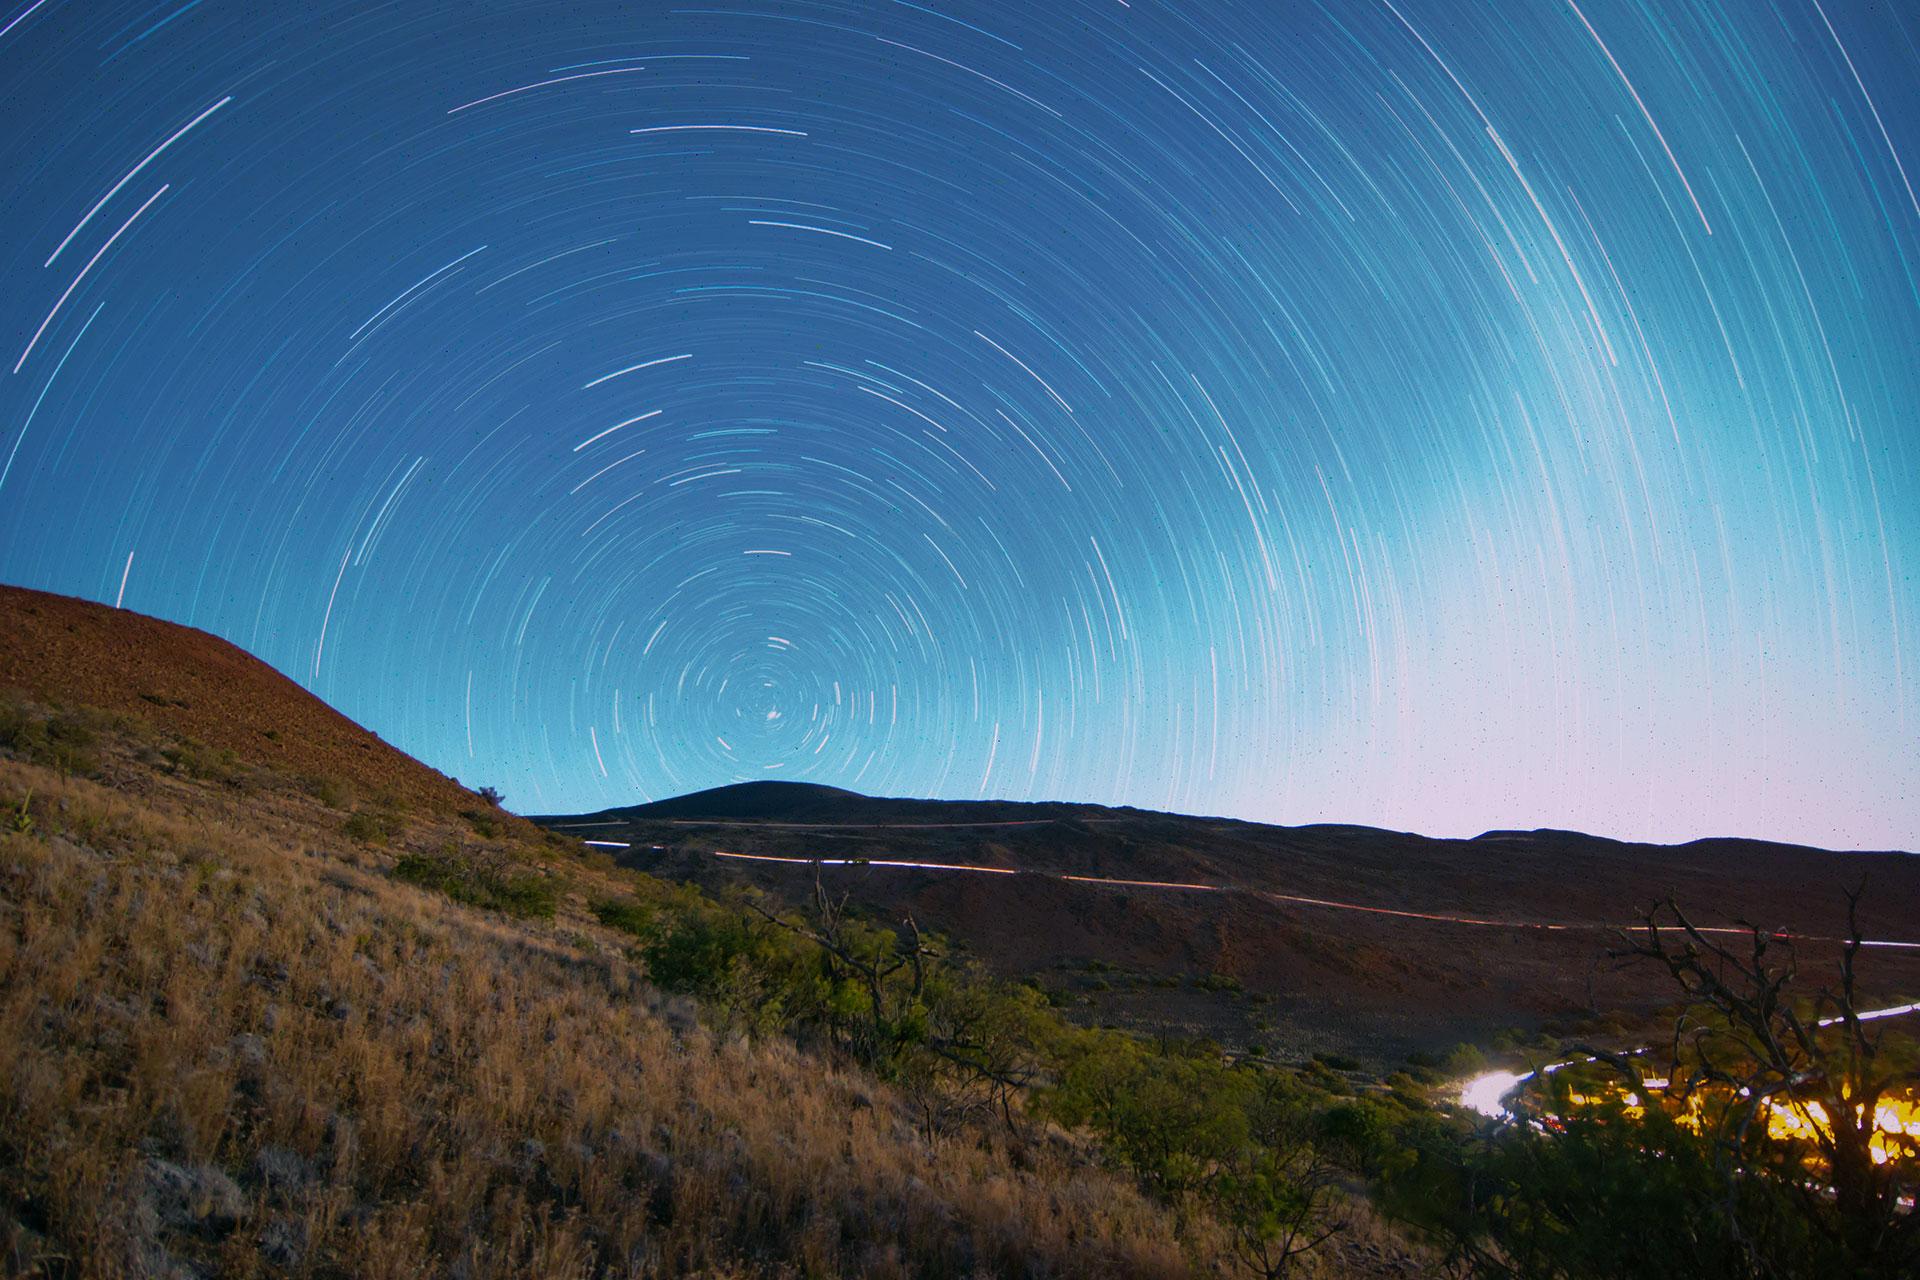 Mauna Kea Star Trail. Photo by Justin McWilliams/Flickr. https://www.flickr.com/photos/drumskater80/7546090148/in/photolist-cuPFGy-cuPGbN-cuPGMQ-cXWA5u-cuPEP9